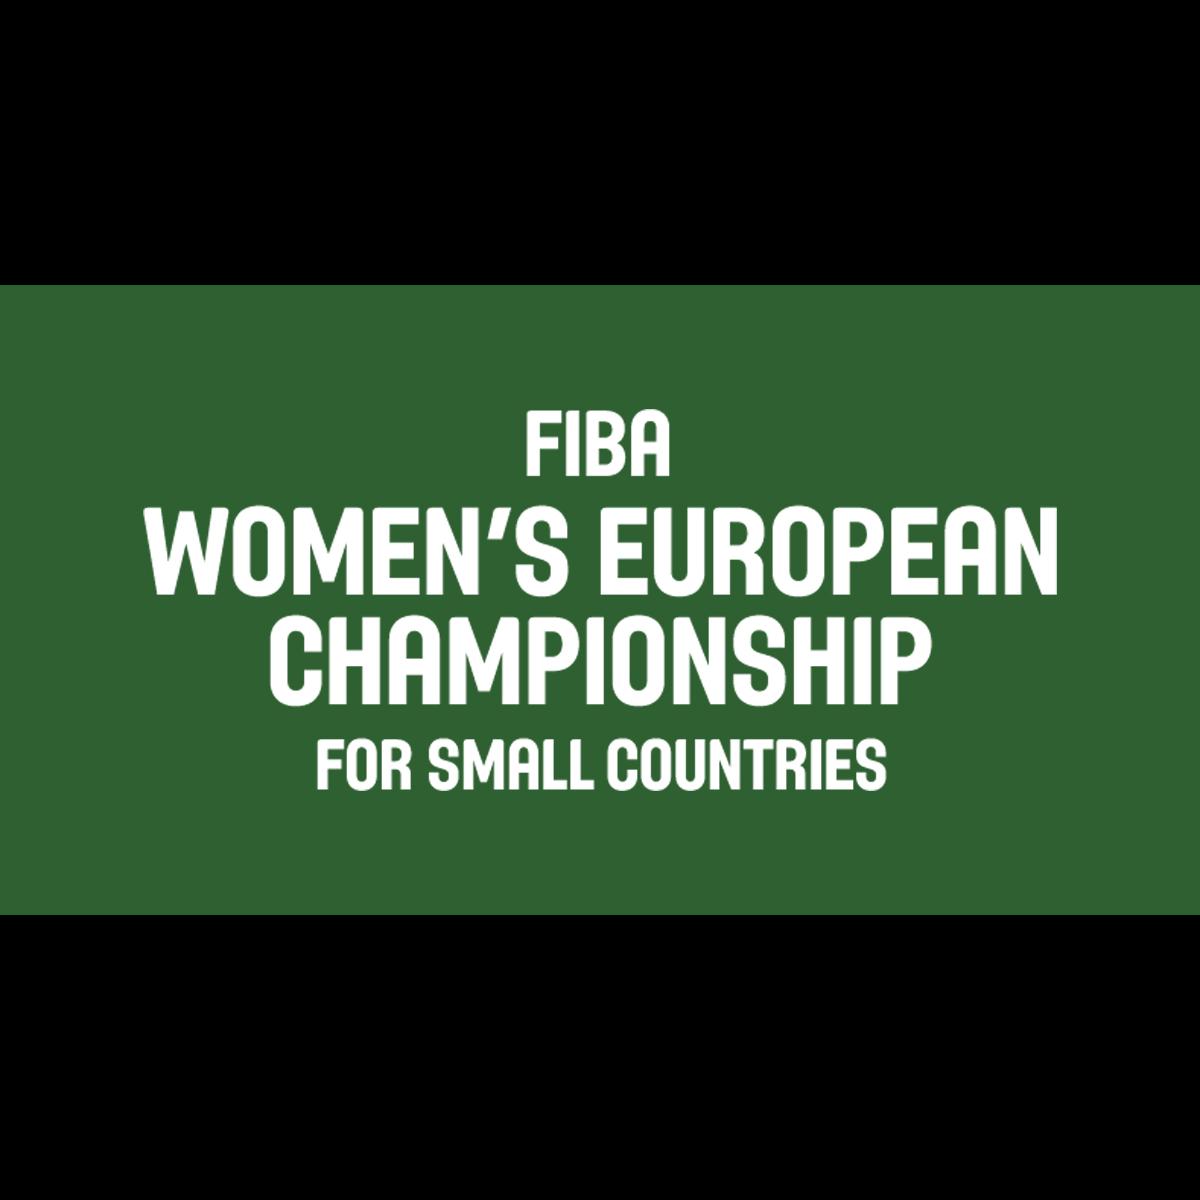 2018 FIBA Basketball Women's European Championship for Small Countries